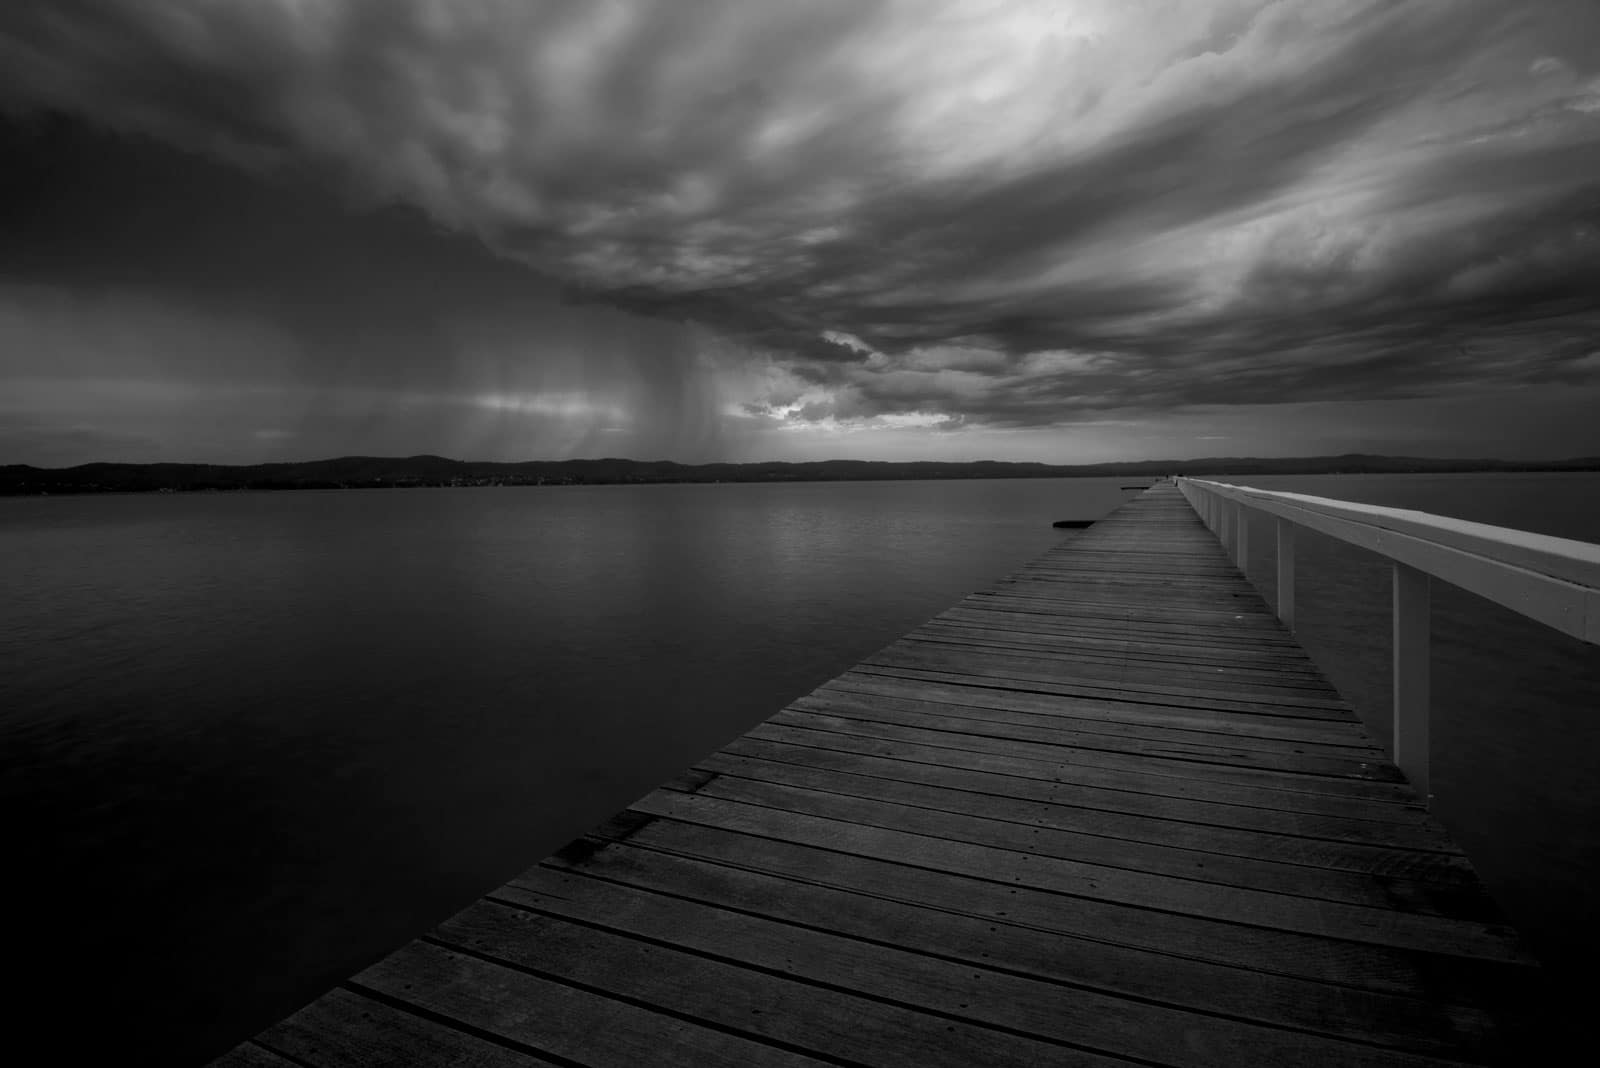 storm-over-long-jetty-tuggerah-lake-by-matt-dobson